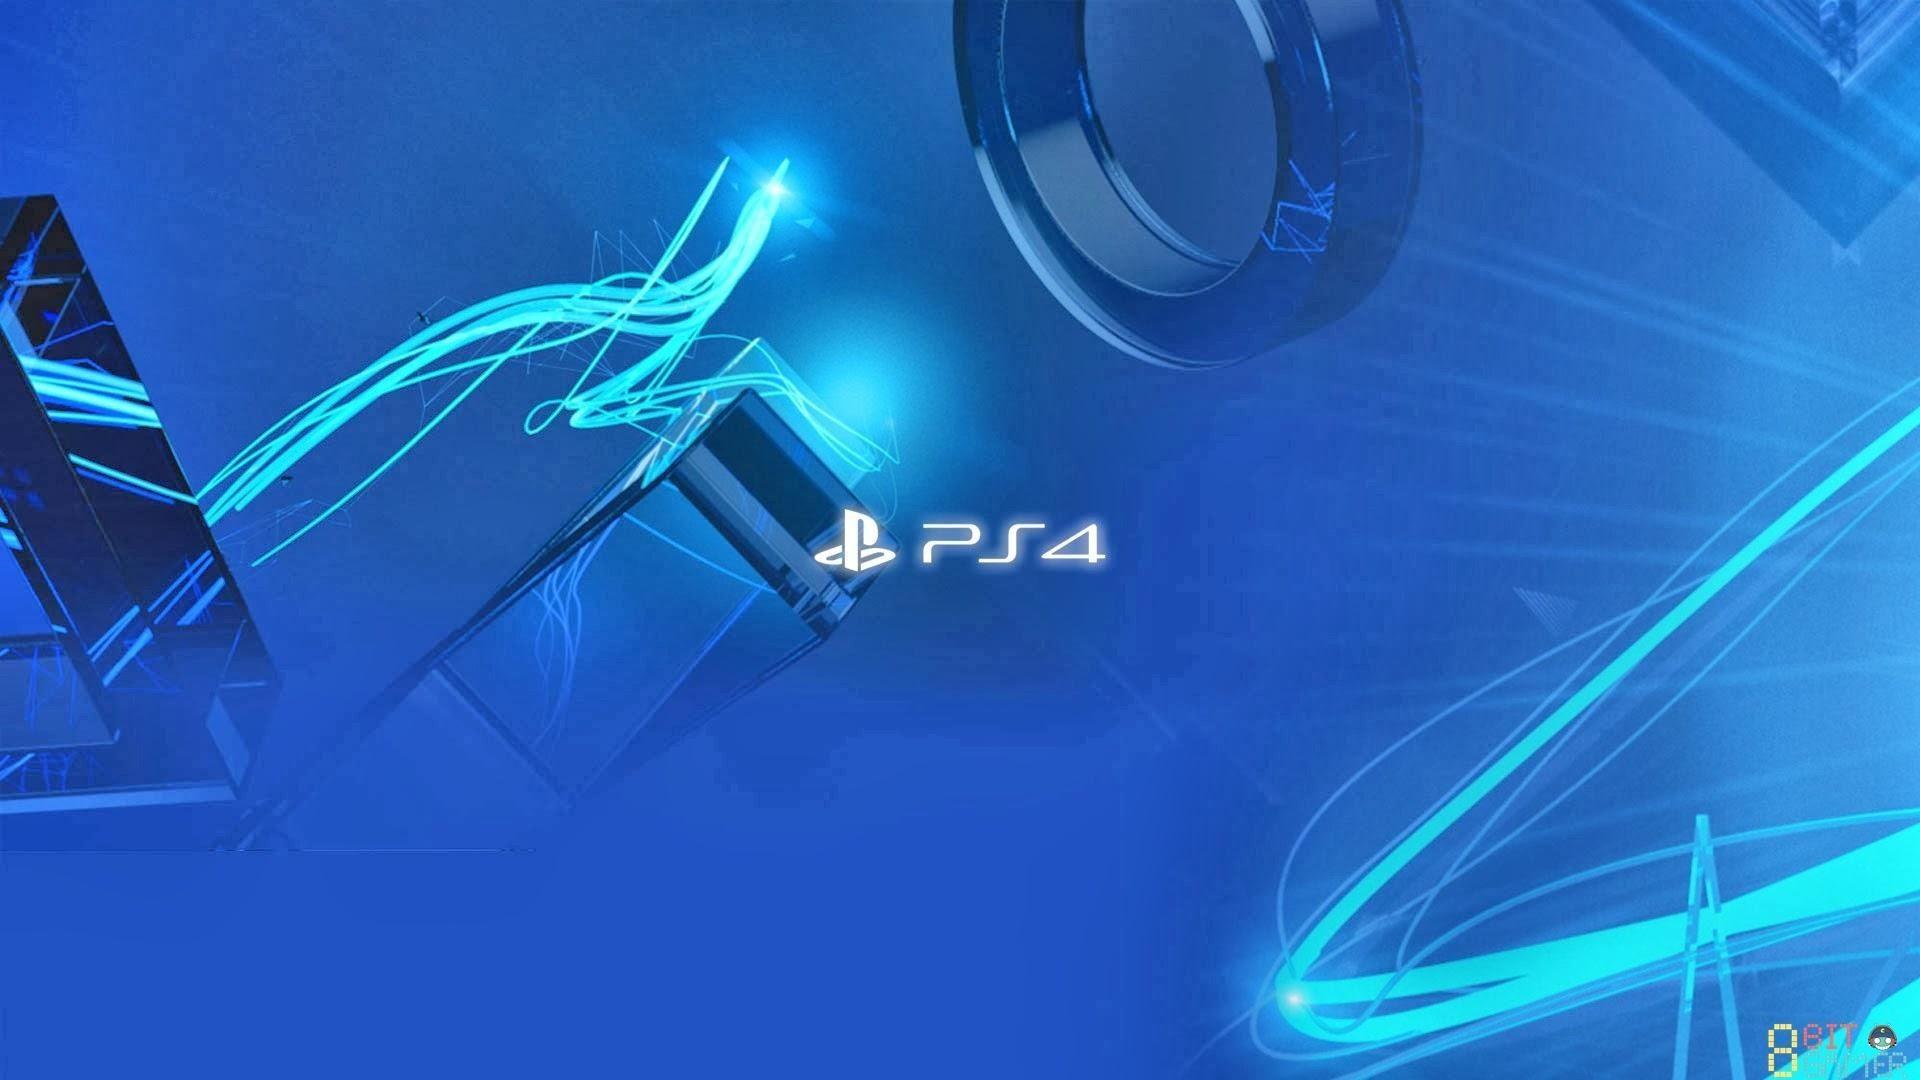 Fonds d?cran Playstation 4 : tous les wallpapers Playstation 4